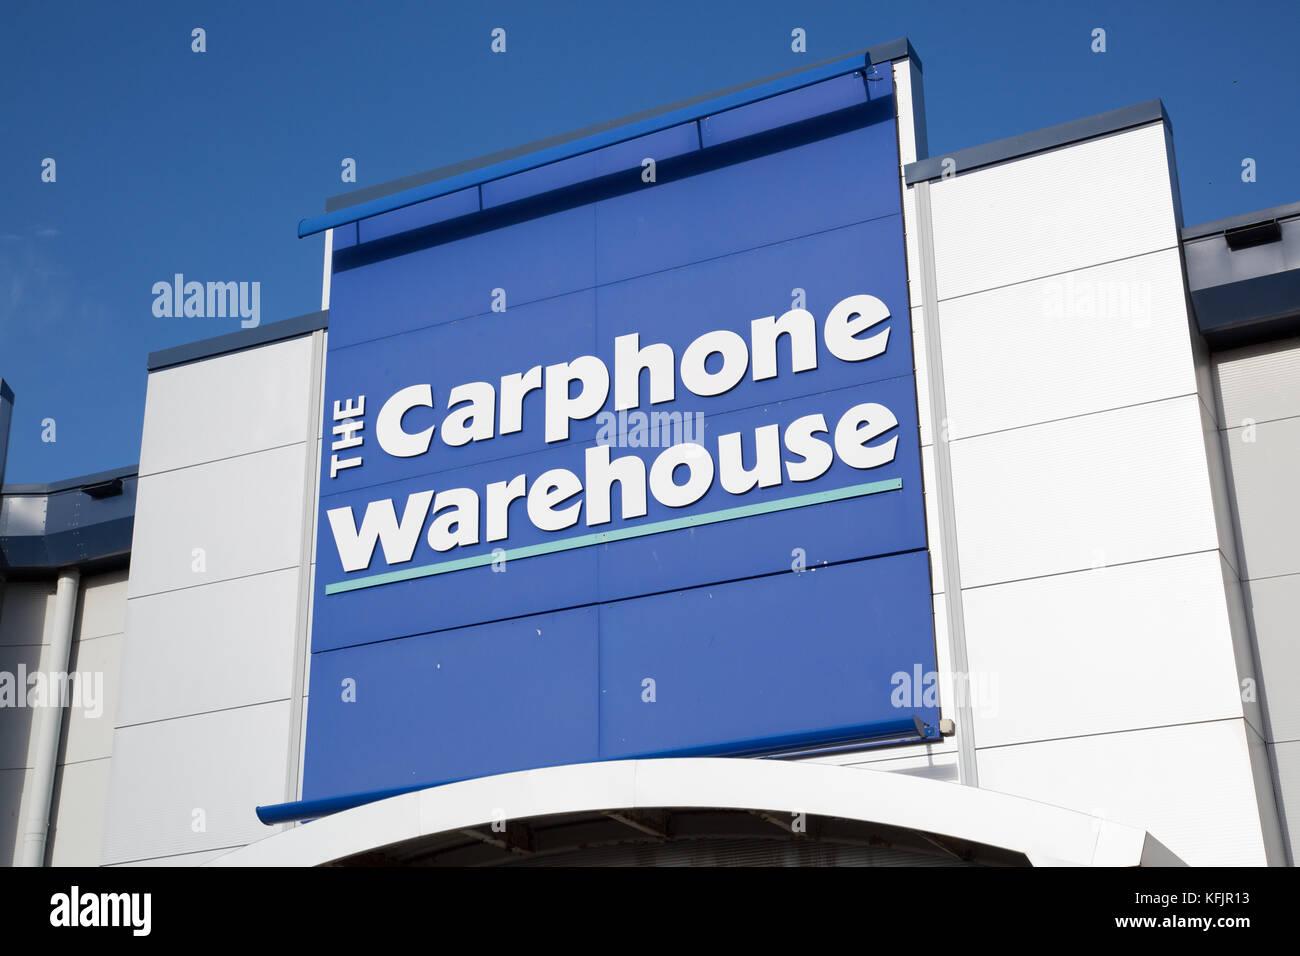 carphone warehouse Phone house komt voort uit carphone warehouse group plc, die in 1989 in londen werd opgericht met £ 6000 spaargeld door charles dunstone.